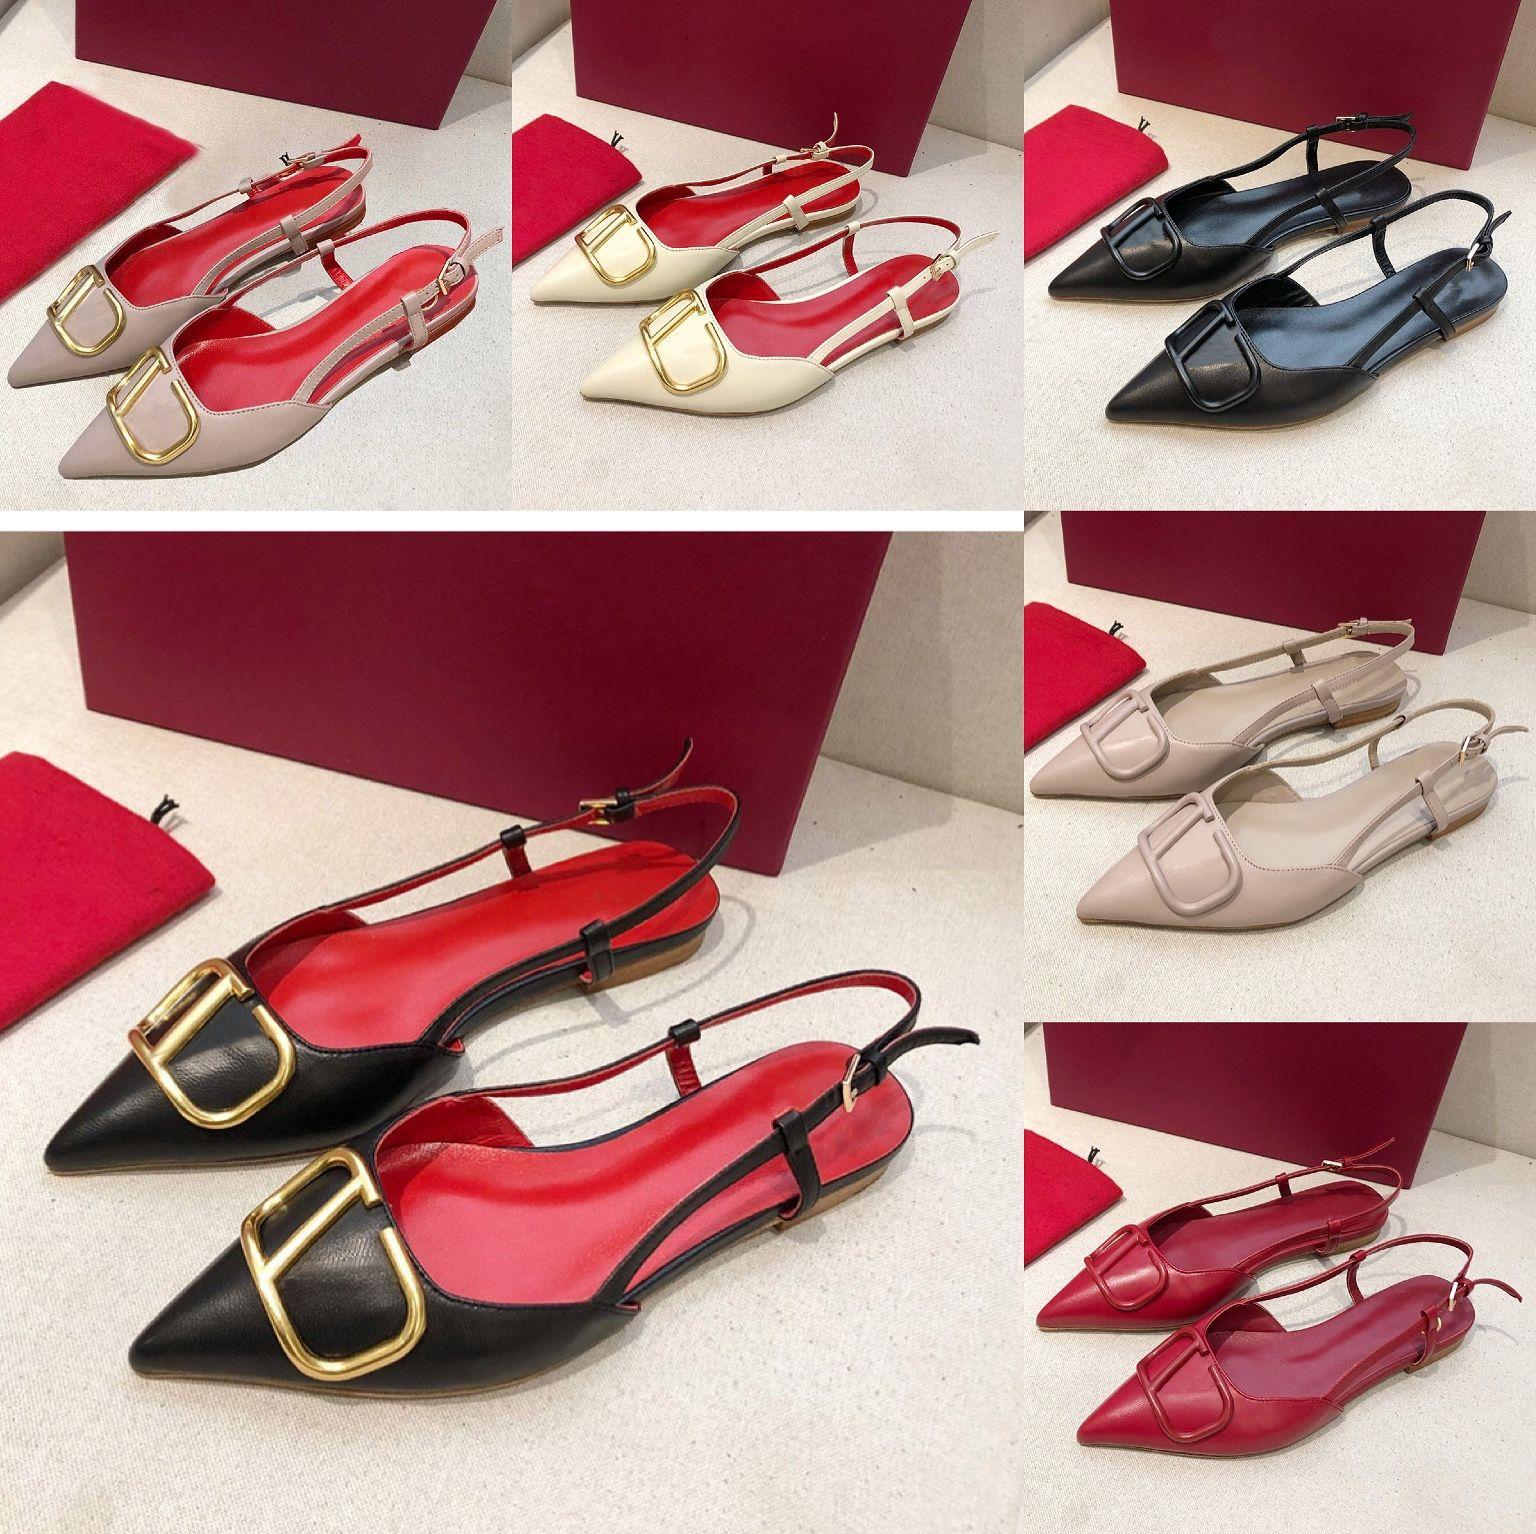 Qinmin123 Plate-forme de talon haut Valentino Sandales Designer Shox Femmes Chaussures Mode Femmes Robe Cuir véritable Talons